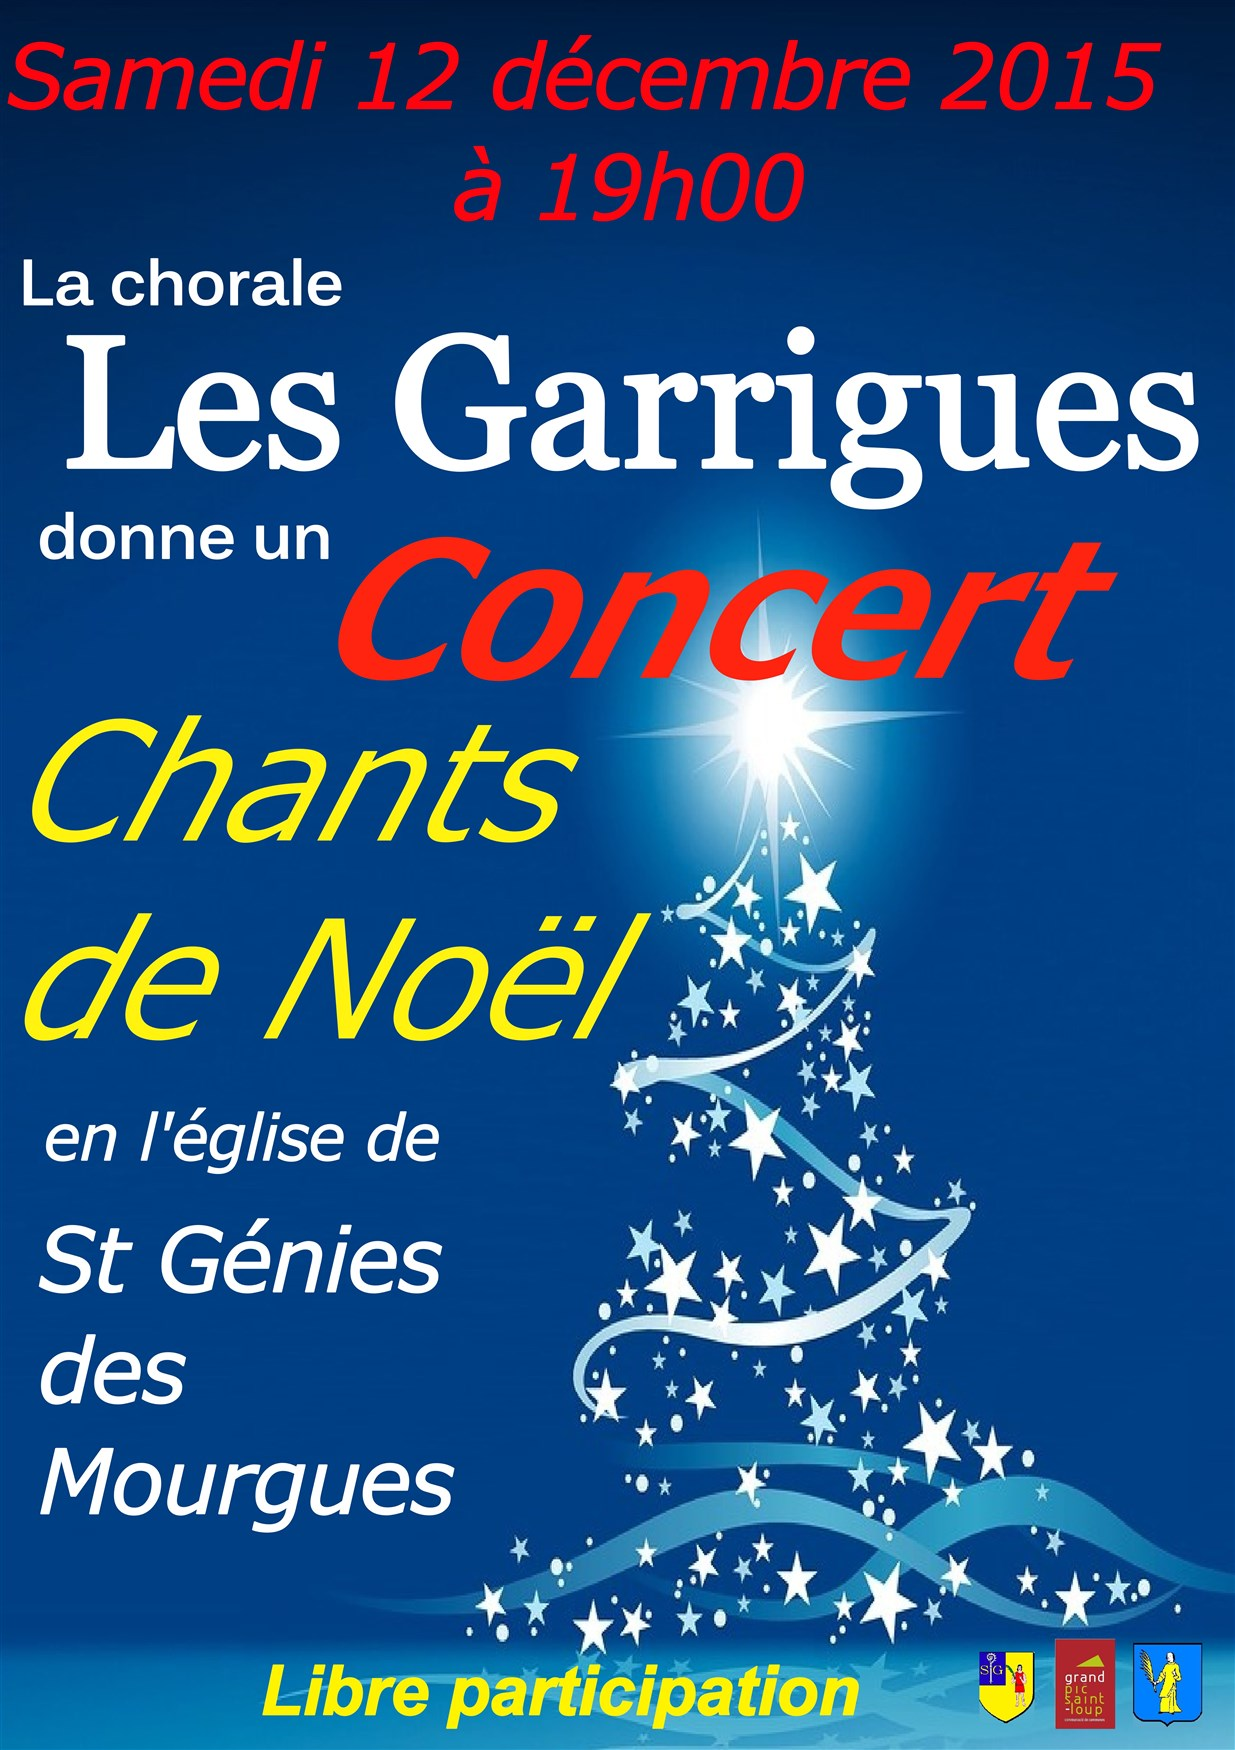 Concert de Noel St Genies des Mourgues